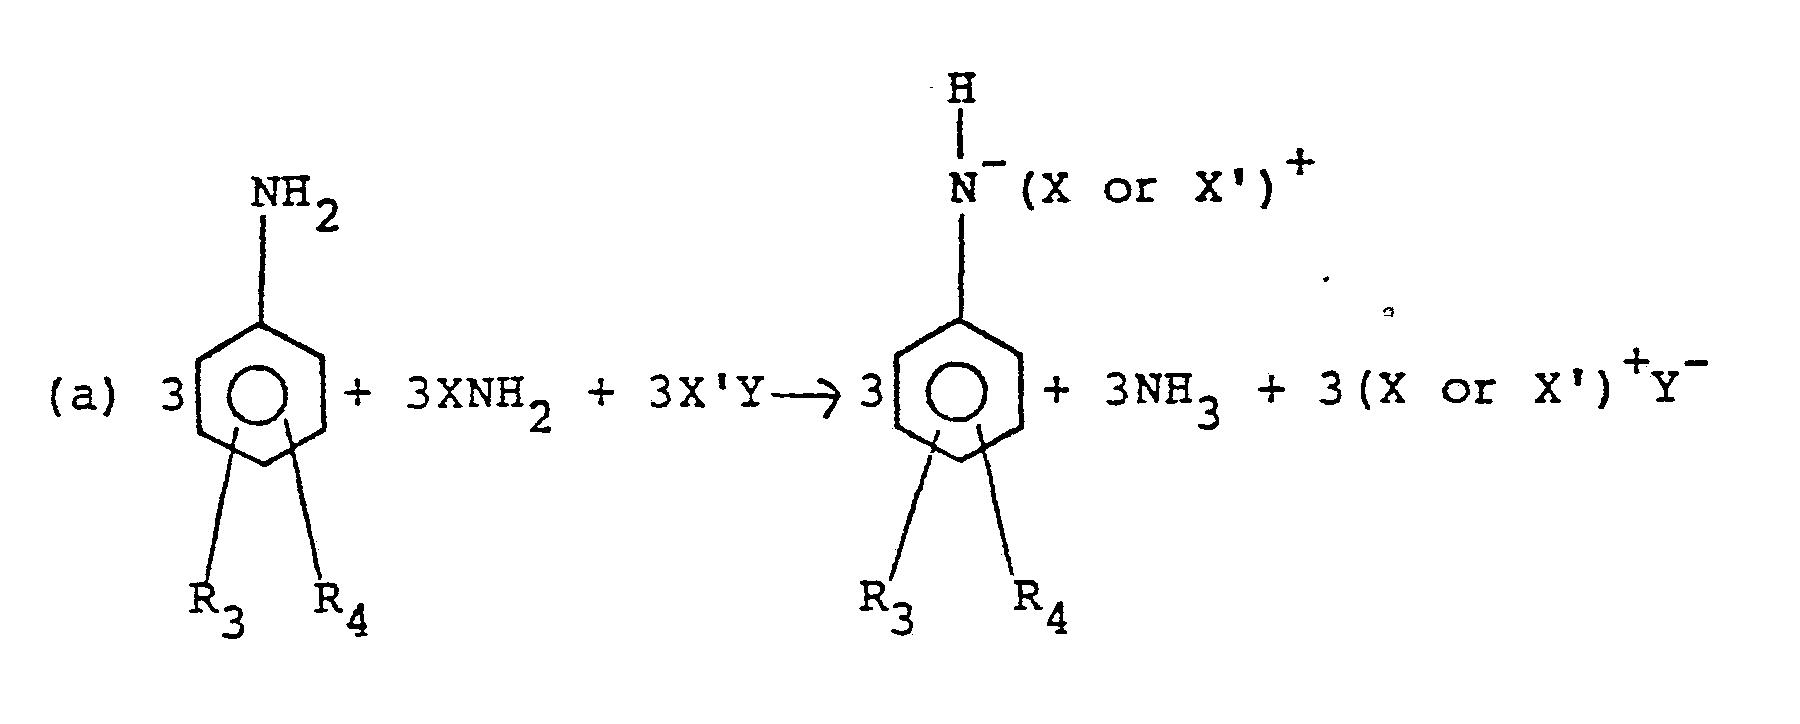 EP0027003A1 - A process for preparing a diarylamine - Google